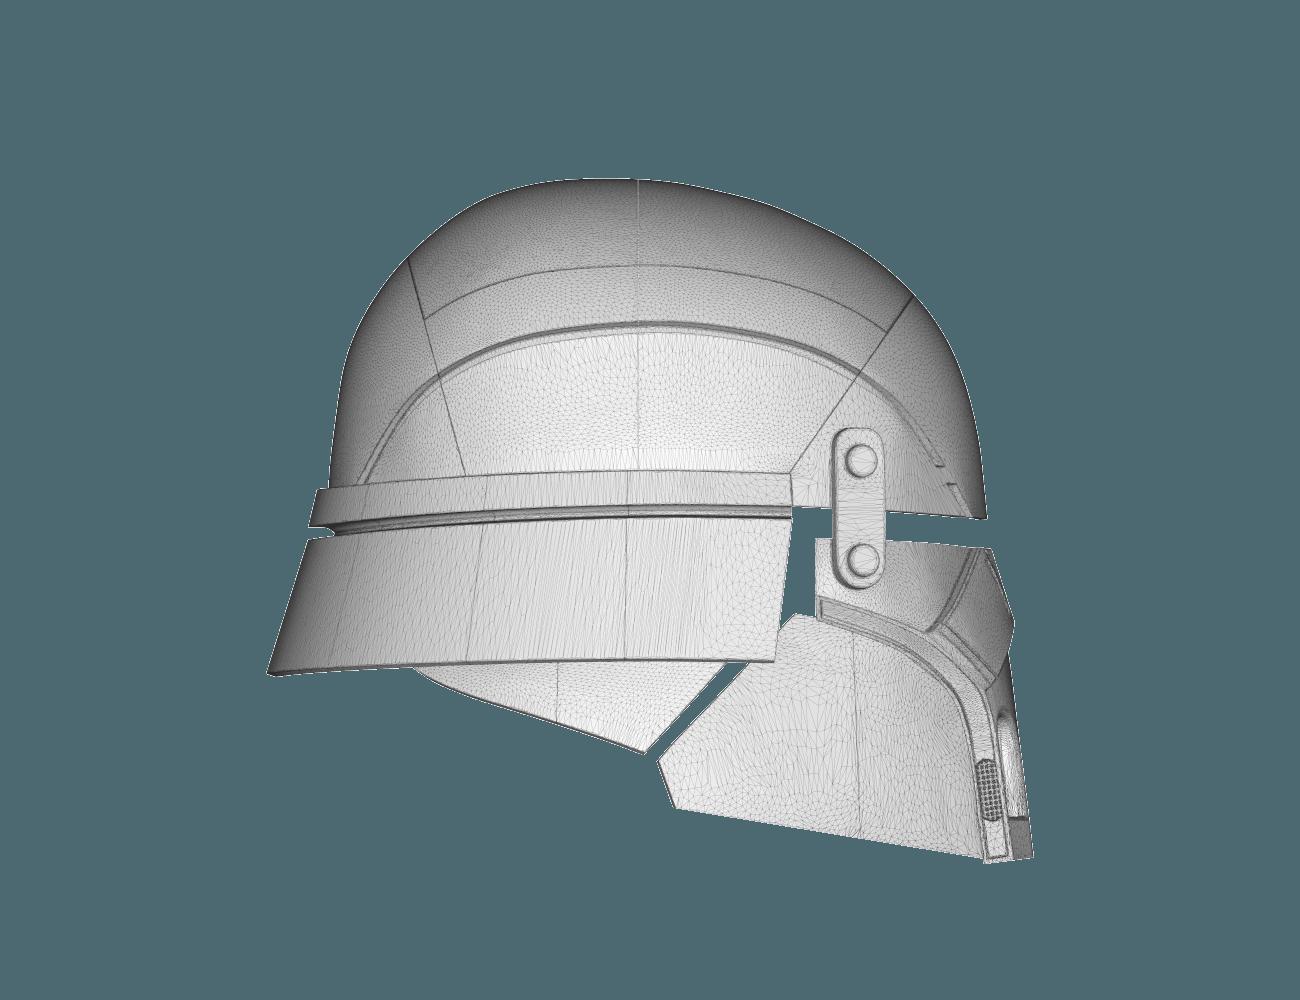 render_scene-left.8.png Download STL file Armory - Knights of Ren Helmet, StarWars model for 3D Print • 3D printing design, 3D-mon